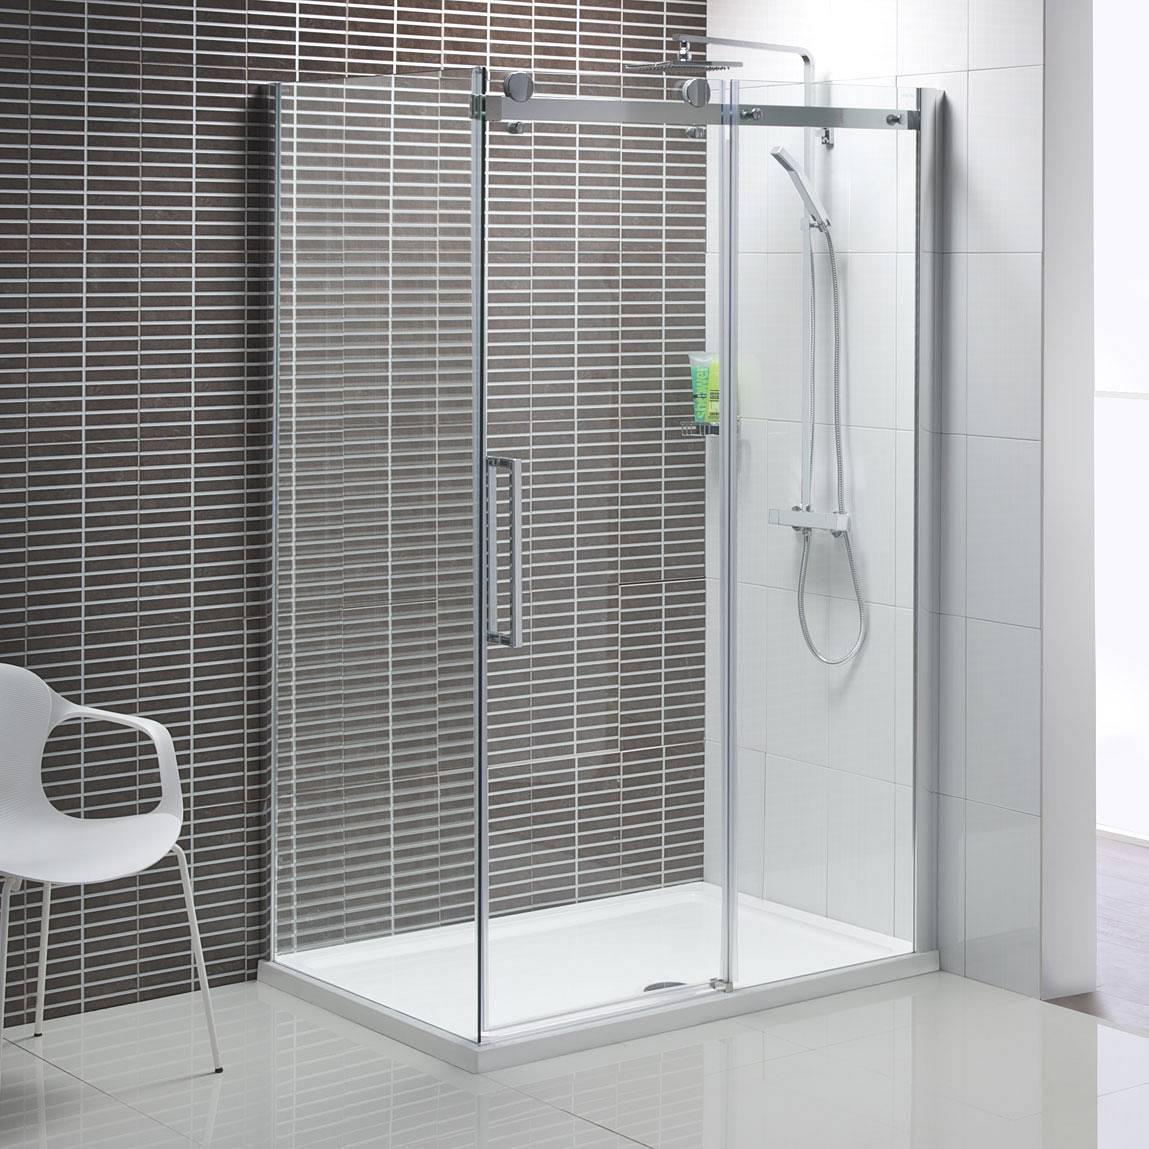 Sliding Glass Doors In Bathroom Interiors Decorideasbathroom